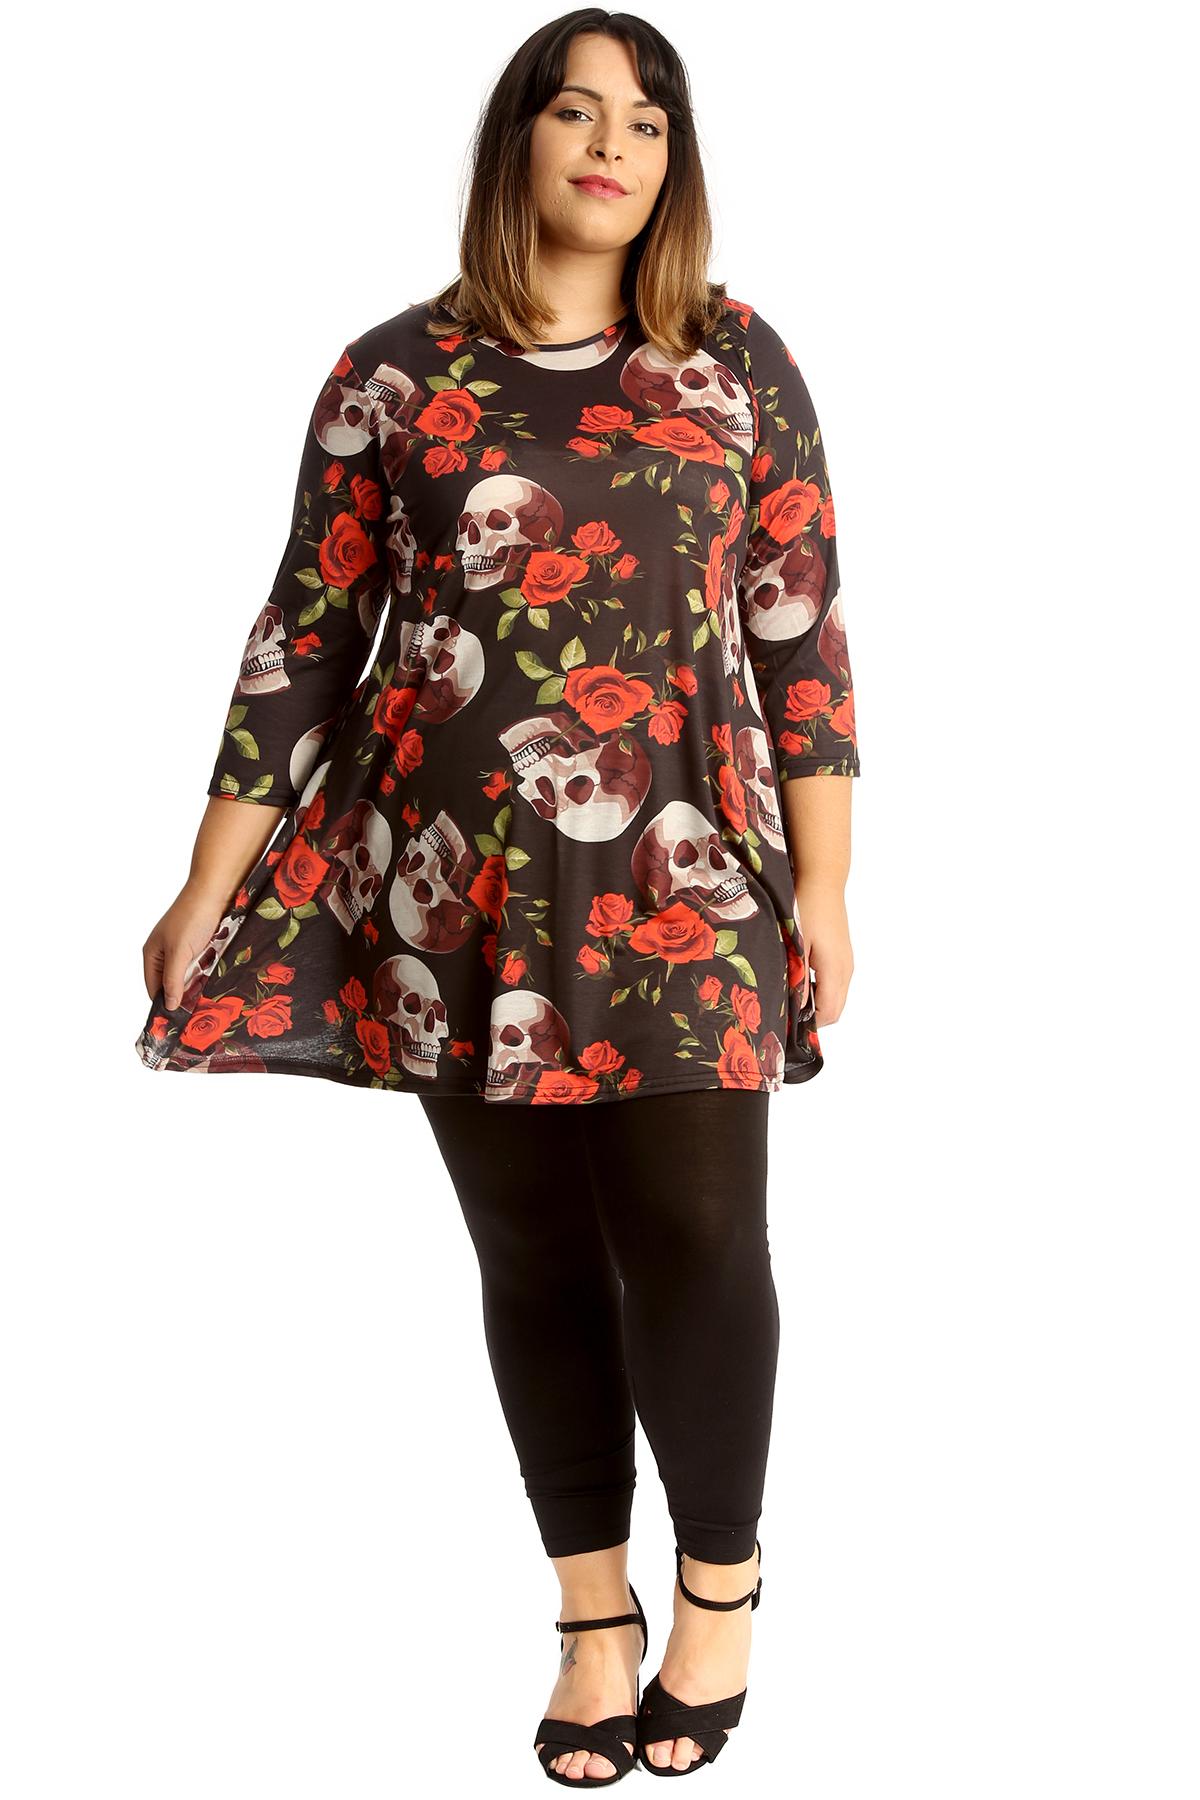 abb99578d533d New Womens Plus Size Swing Top Ladies Skull & Roses Print Skater ...